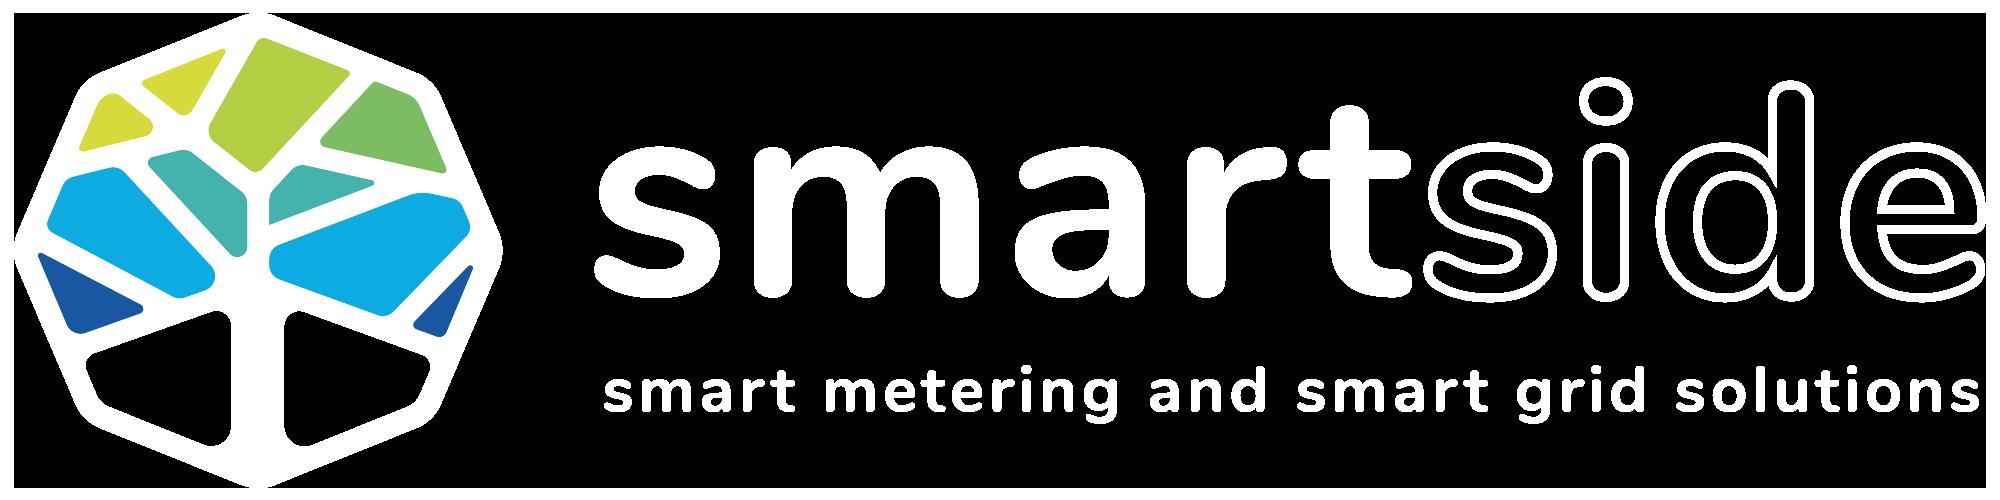 Smartside